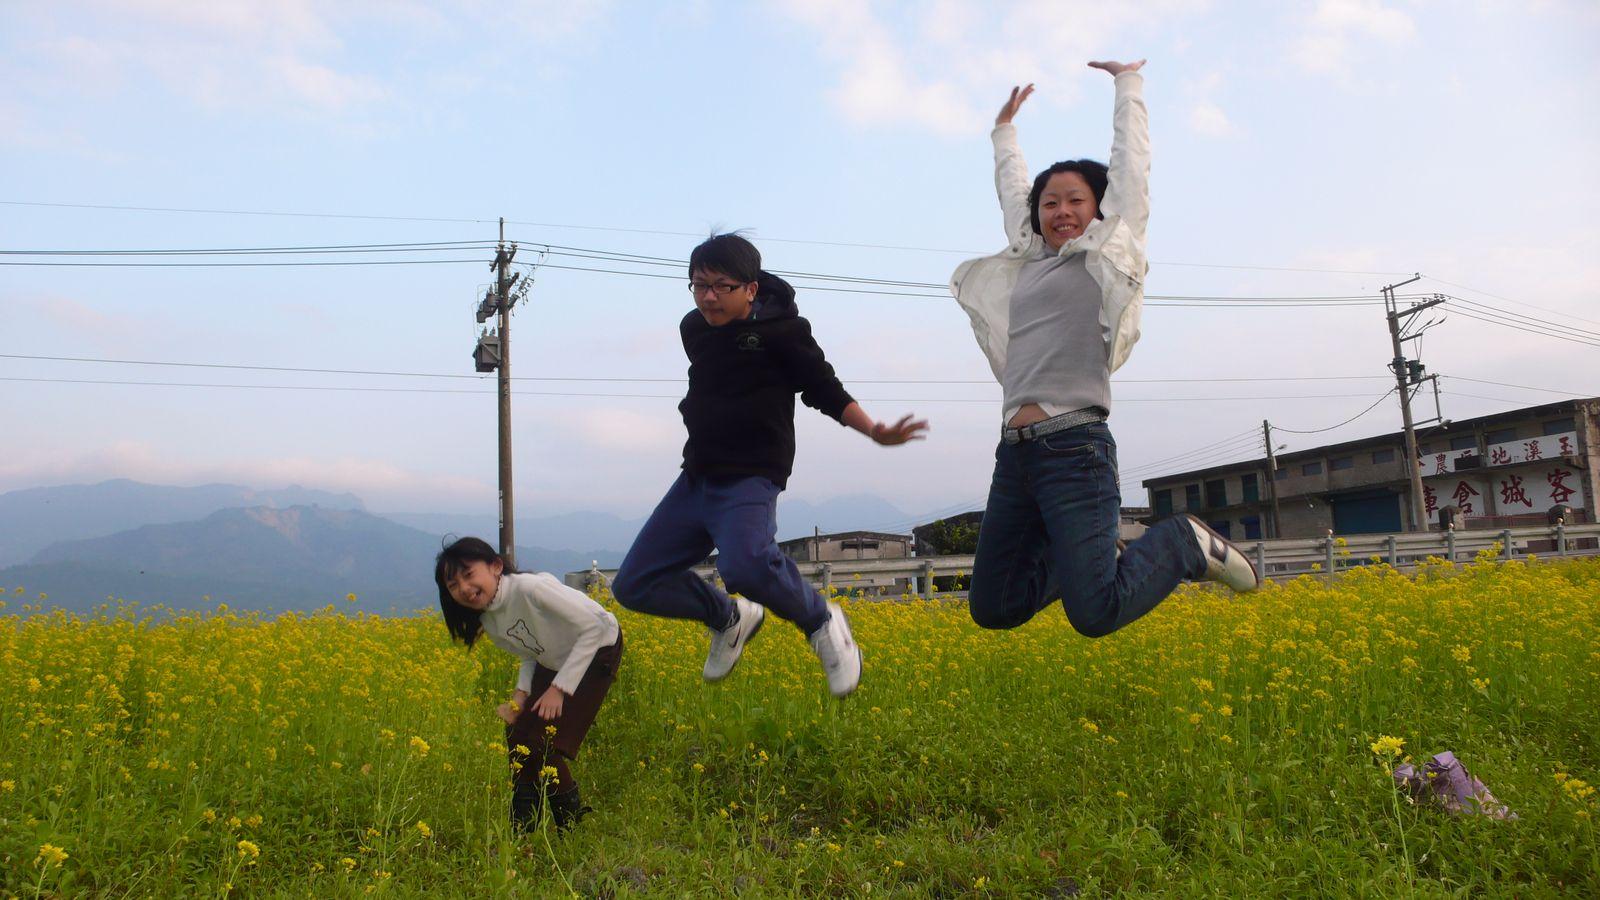 【JS】女子小学生 高学年画像スレPart25【JS】 [転載禁止]©bbspink.comYouTube動画>13本 ->画像>478枚